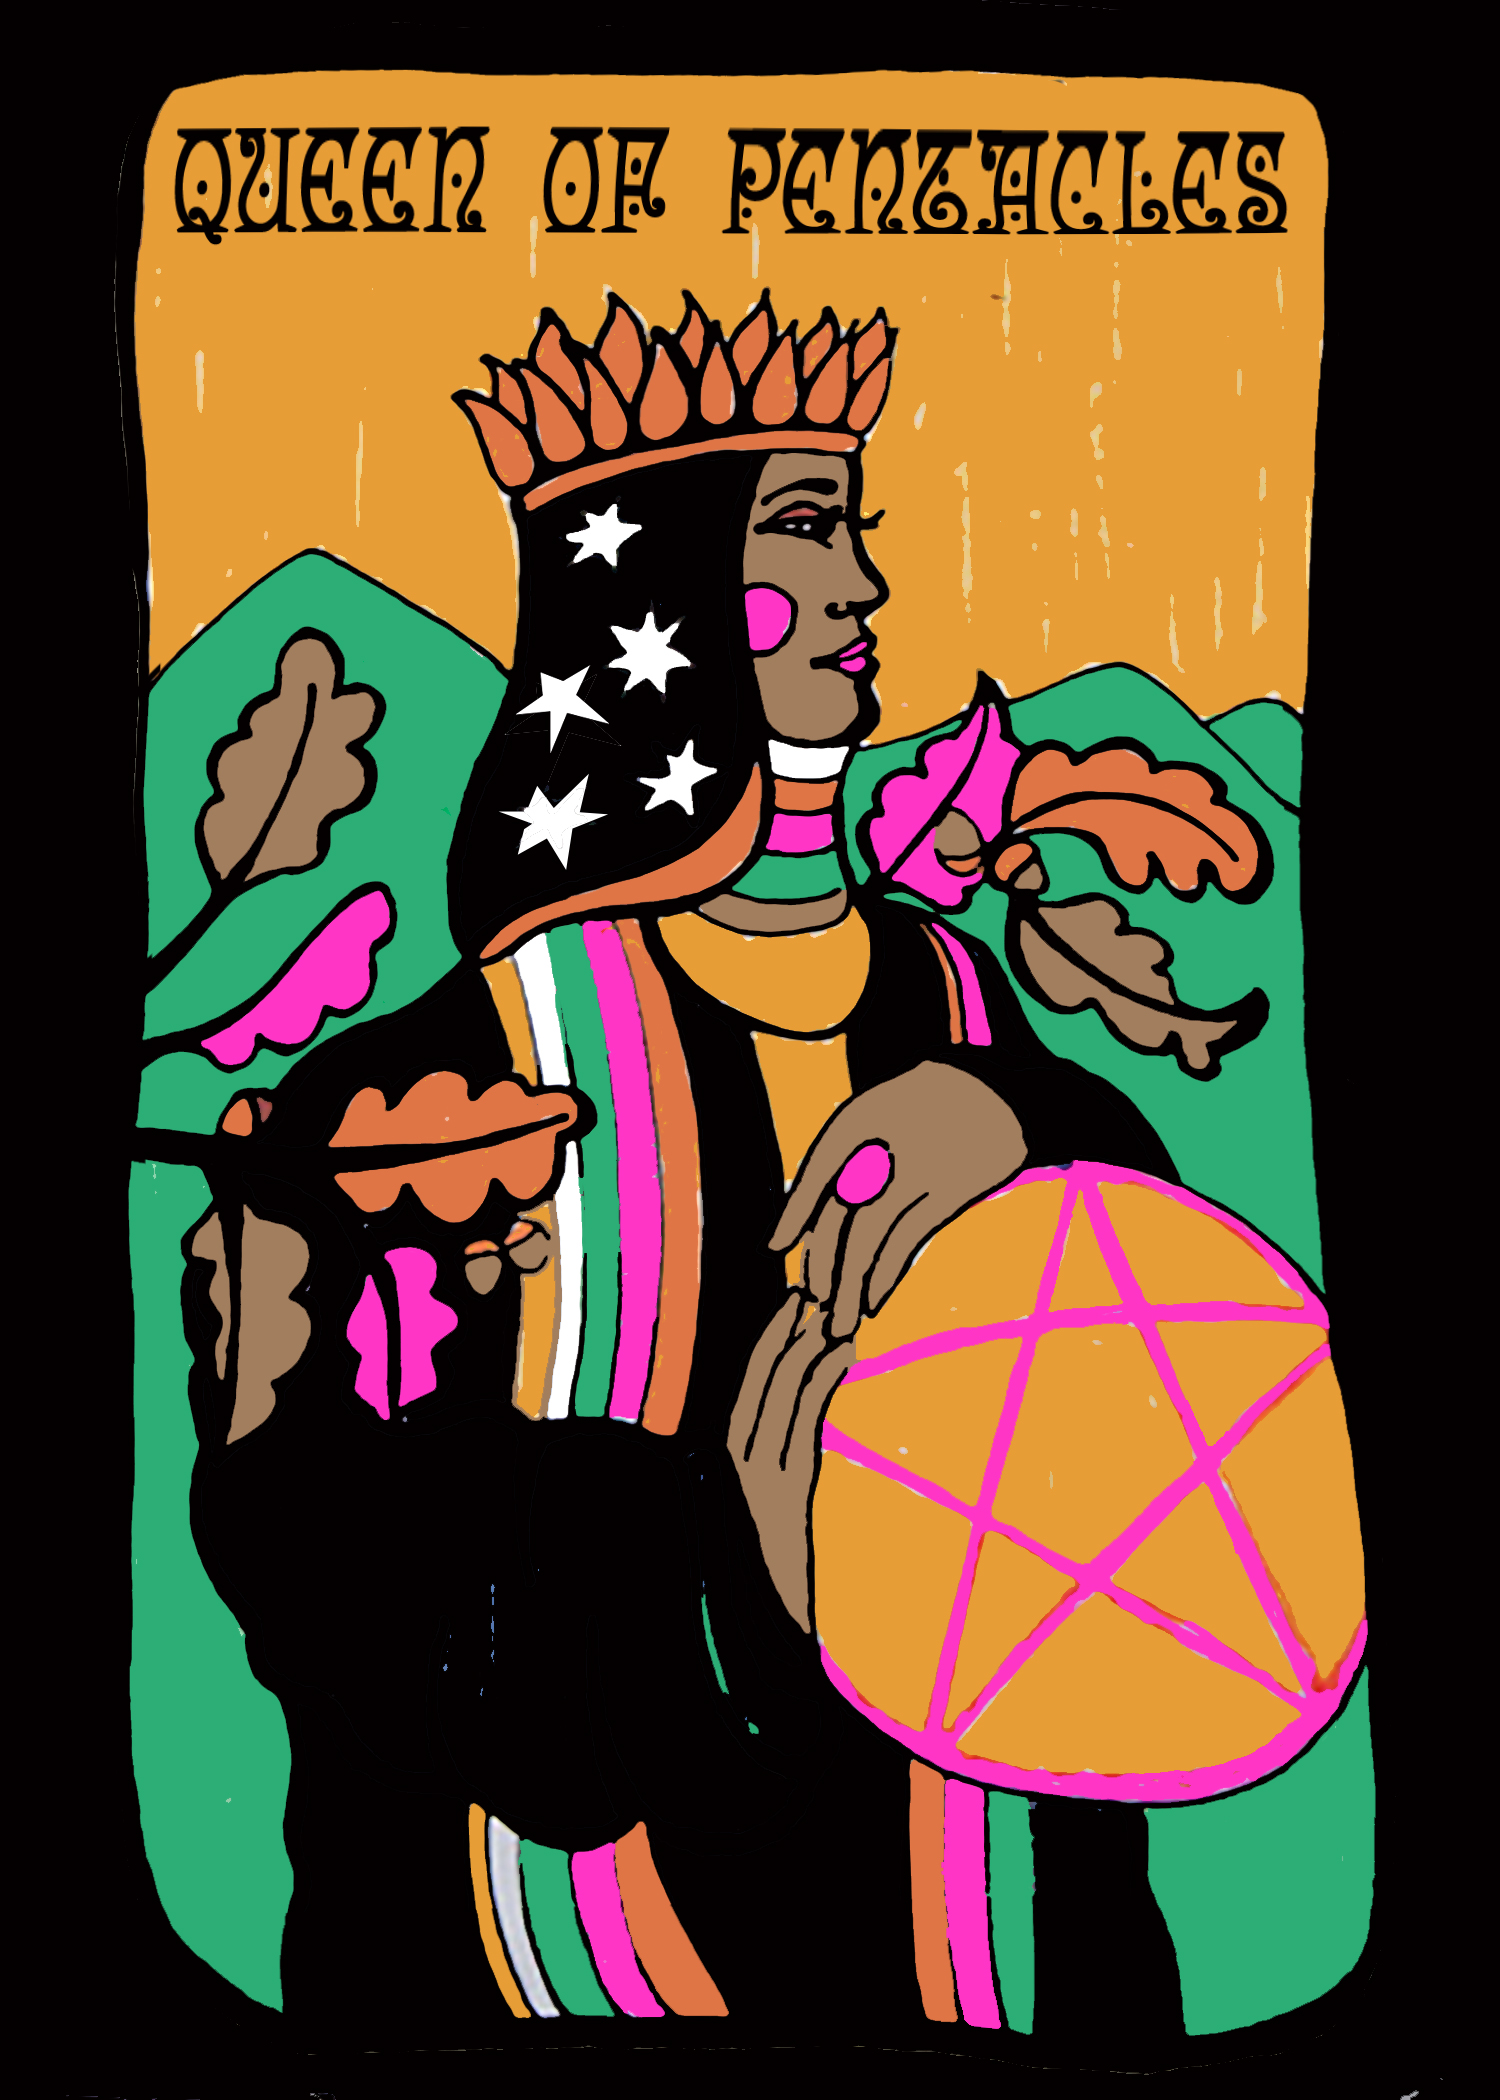 Lesley Numbers - Queen of Pentacles